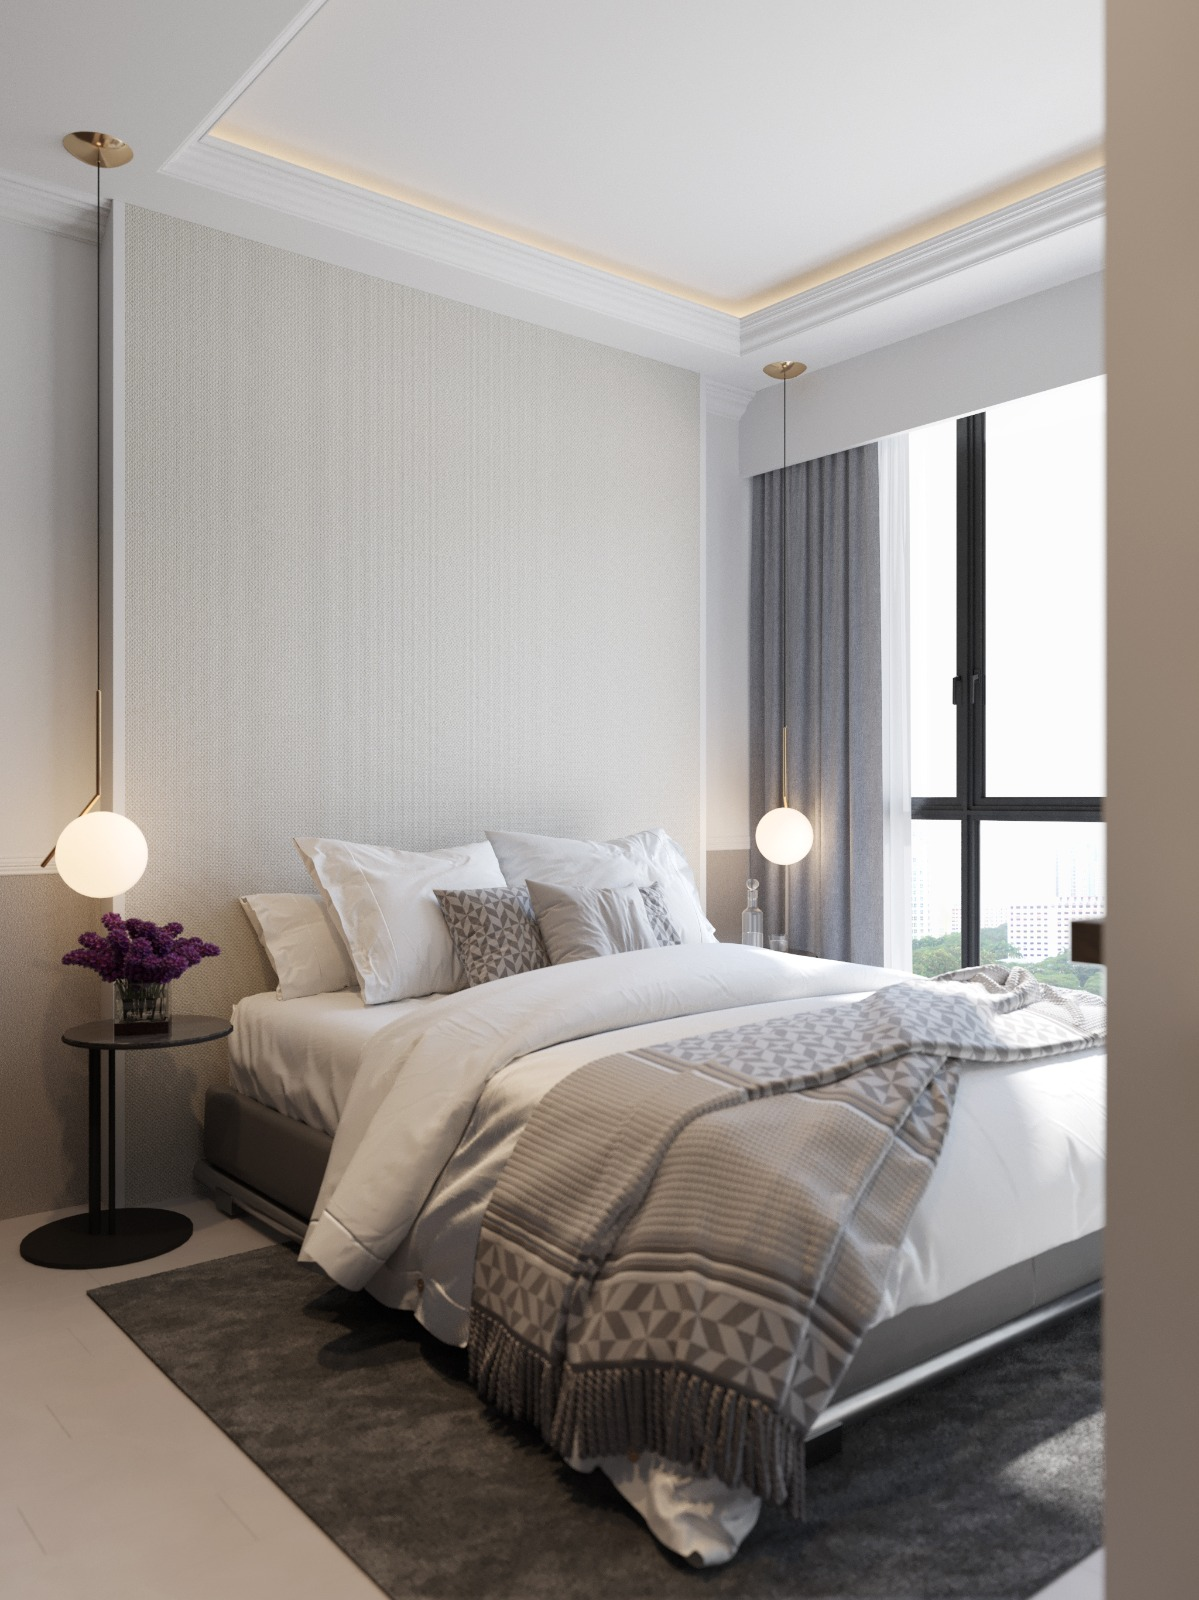 007 Master Bedroom